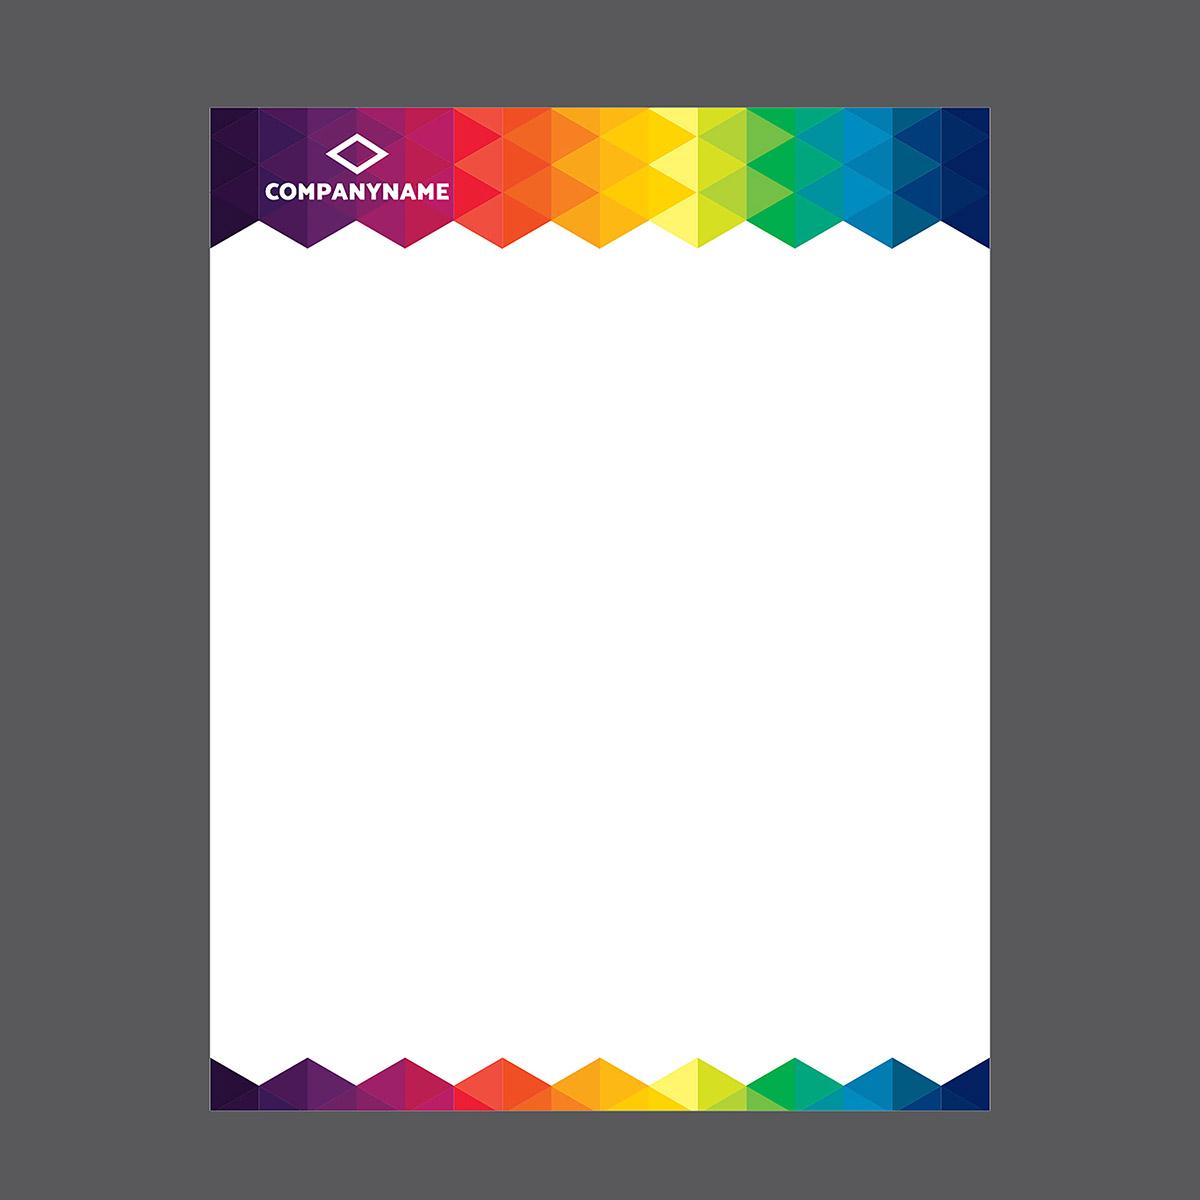 Colorful Letterhead Template